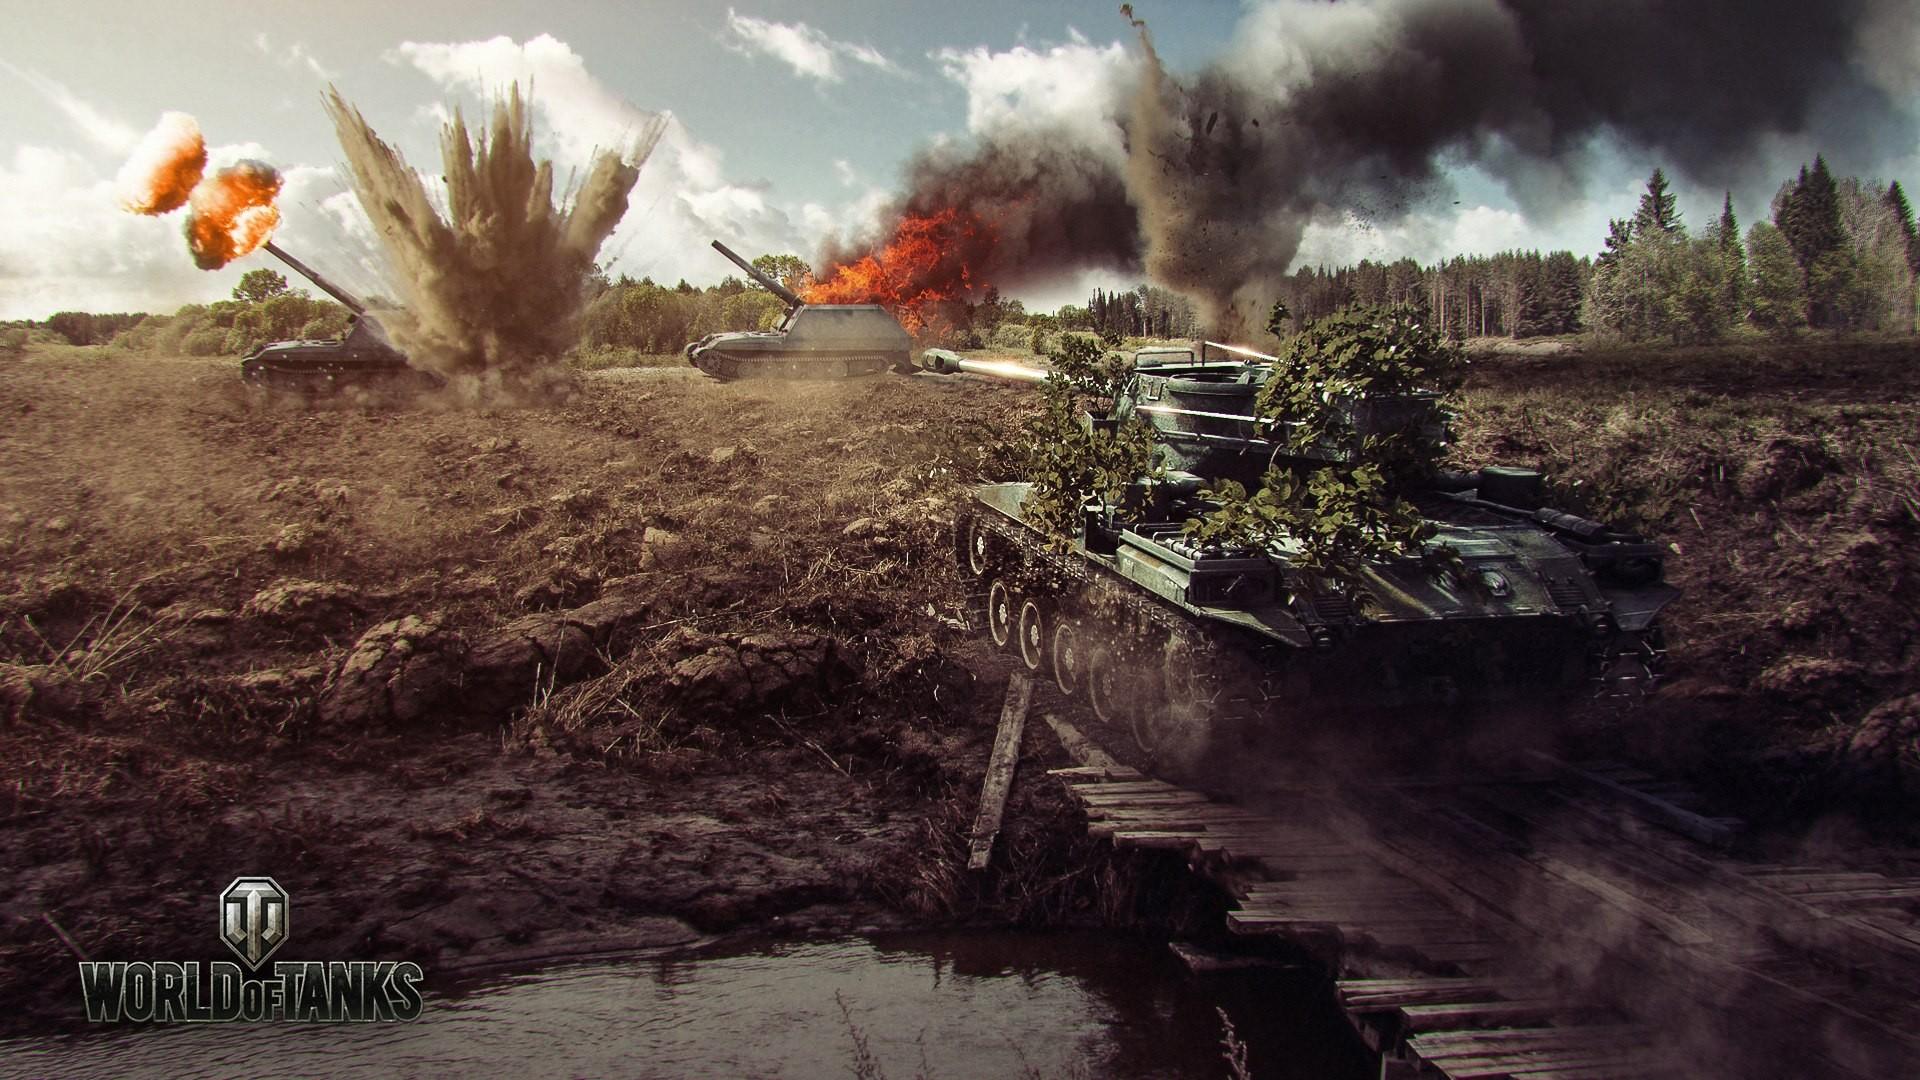 Fond D Ecran Jeux Video Vehicule Feu World Of Tanks Wargaming Catastrophe G W Tiger Incendies Capture D Ecran 1920x1080 Px Sol Phenomene Geologique 1920x1080 711361 Fond D Ecran Wallhere